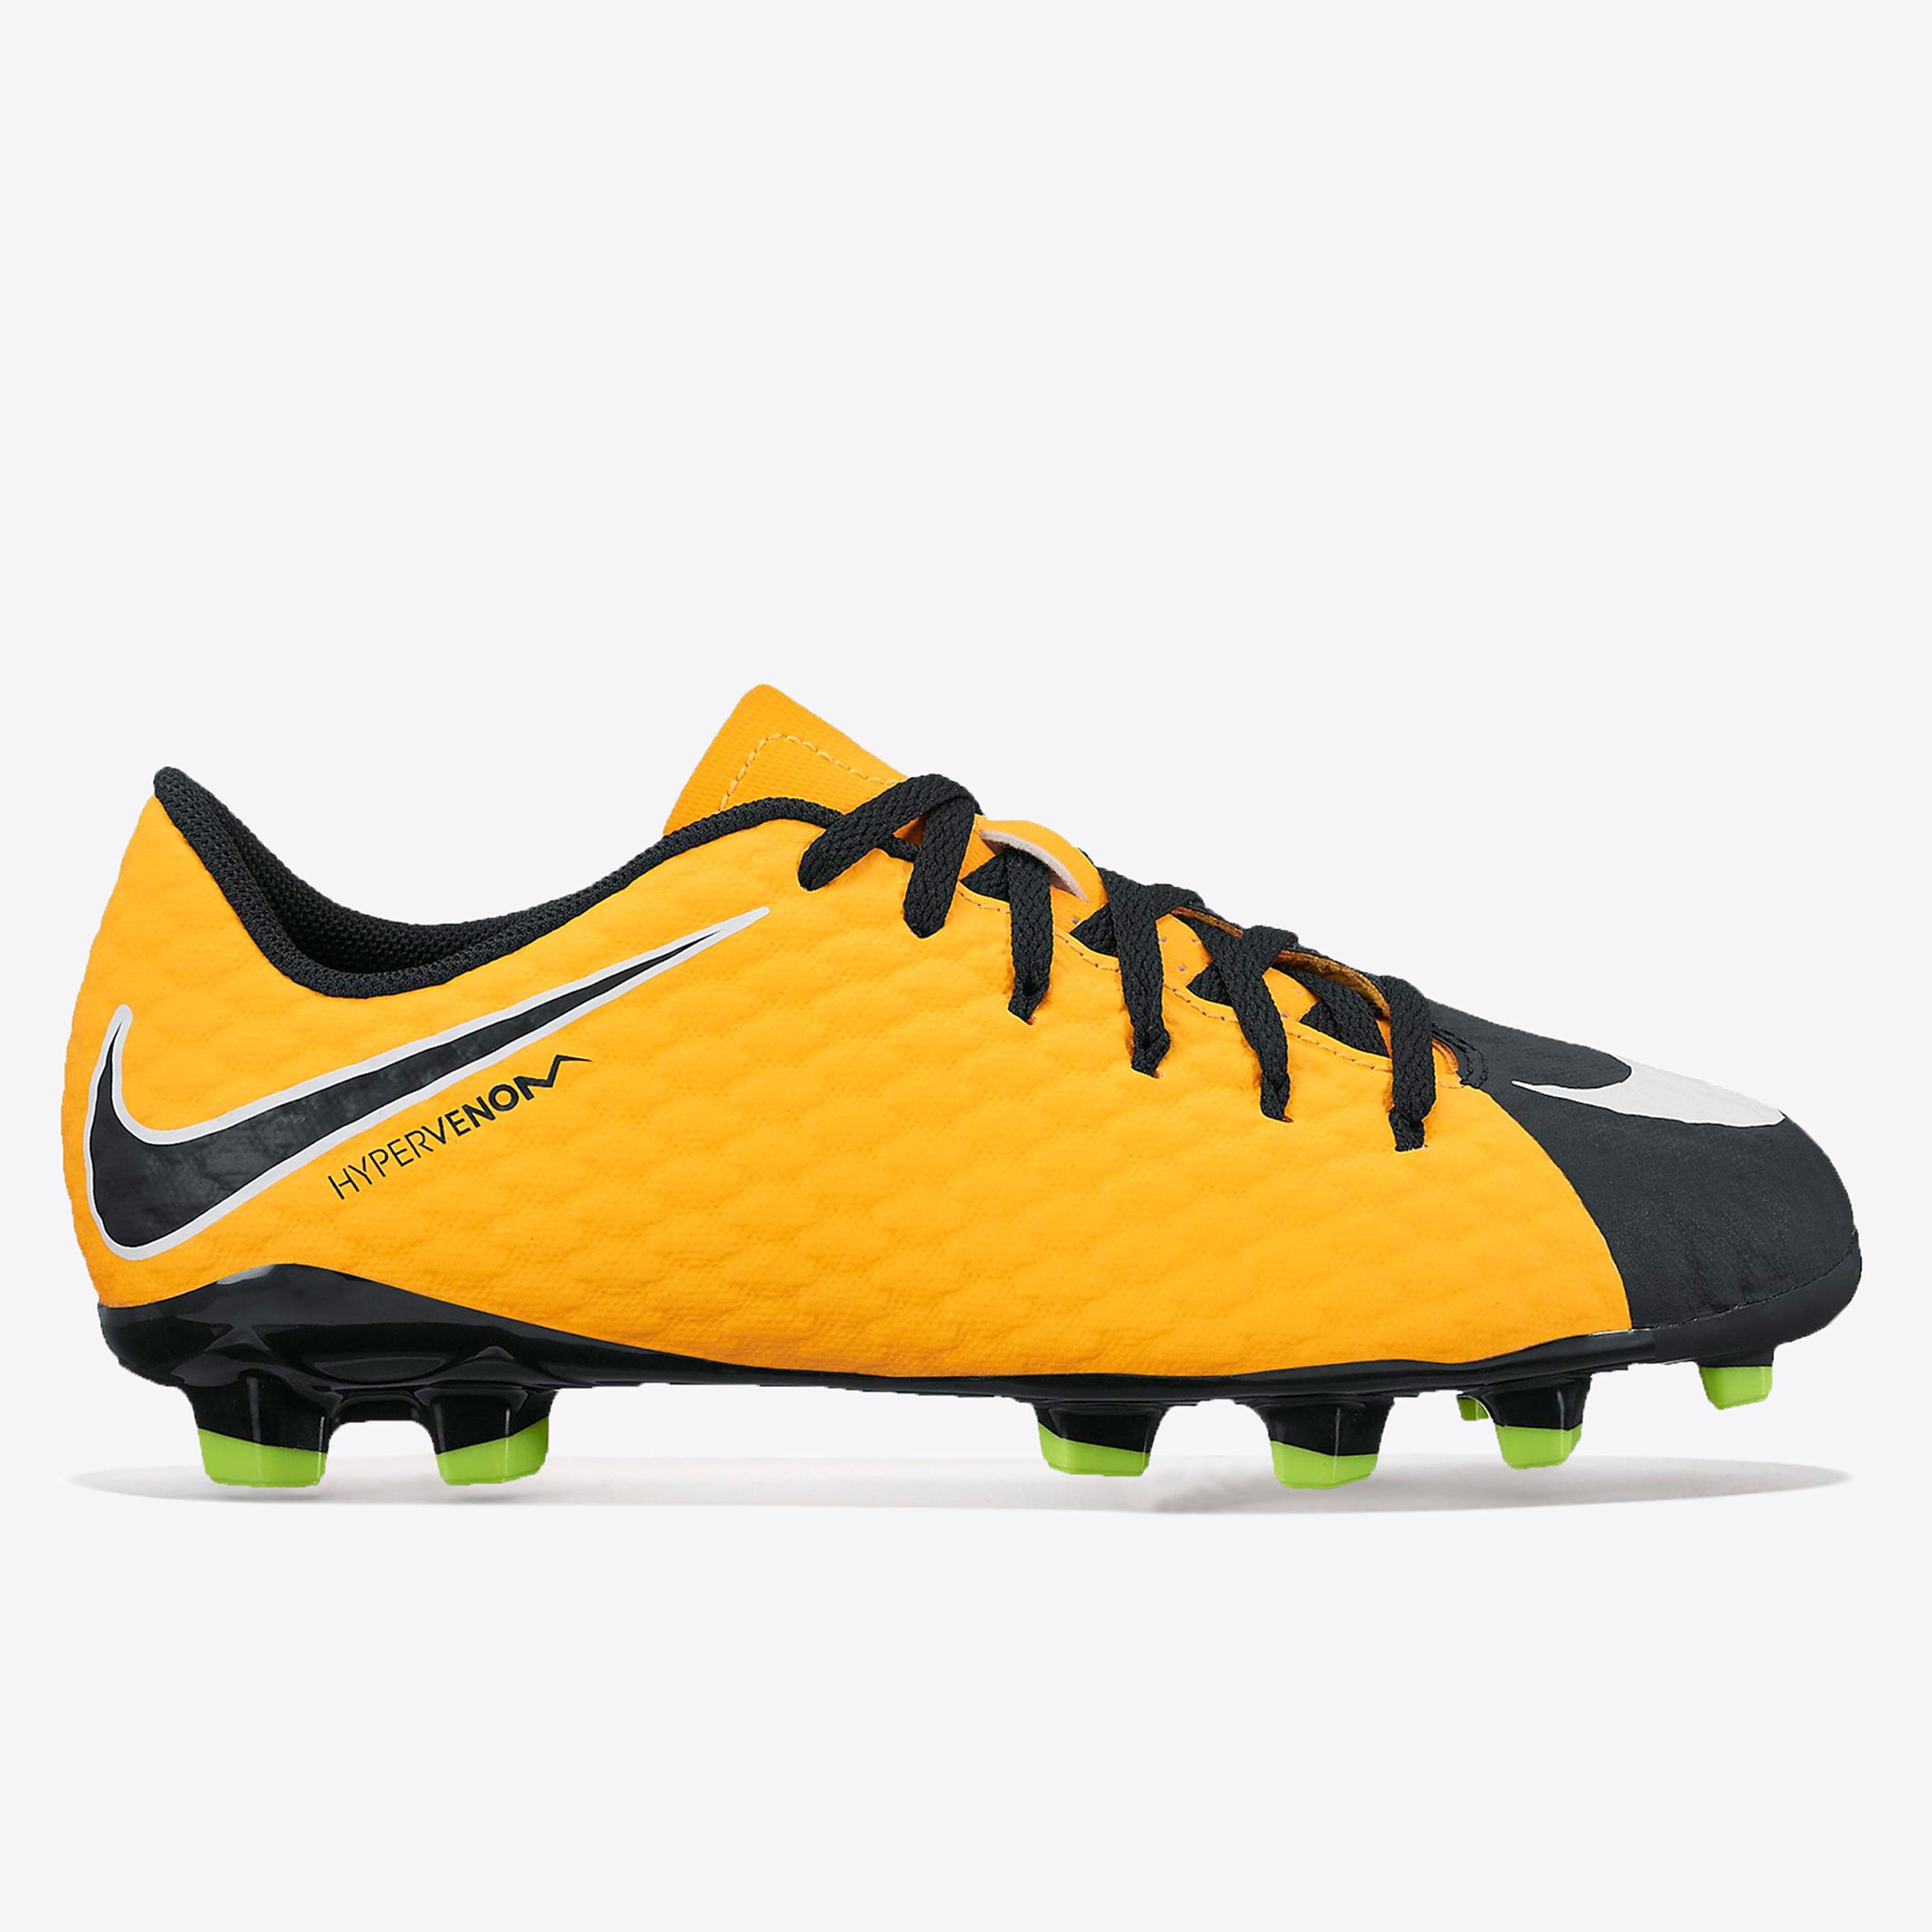 Nike Hypervenom Phelon III Firm Ground Football Boots - Laser Orange/B